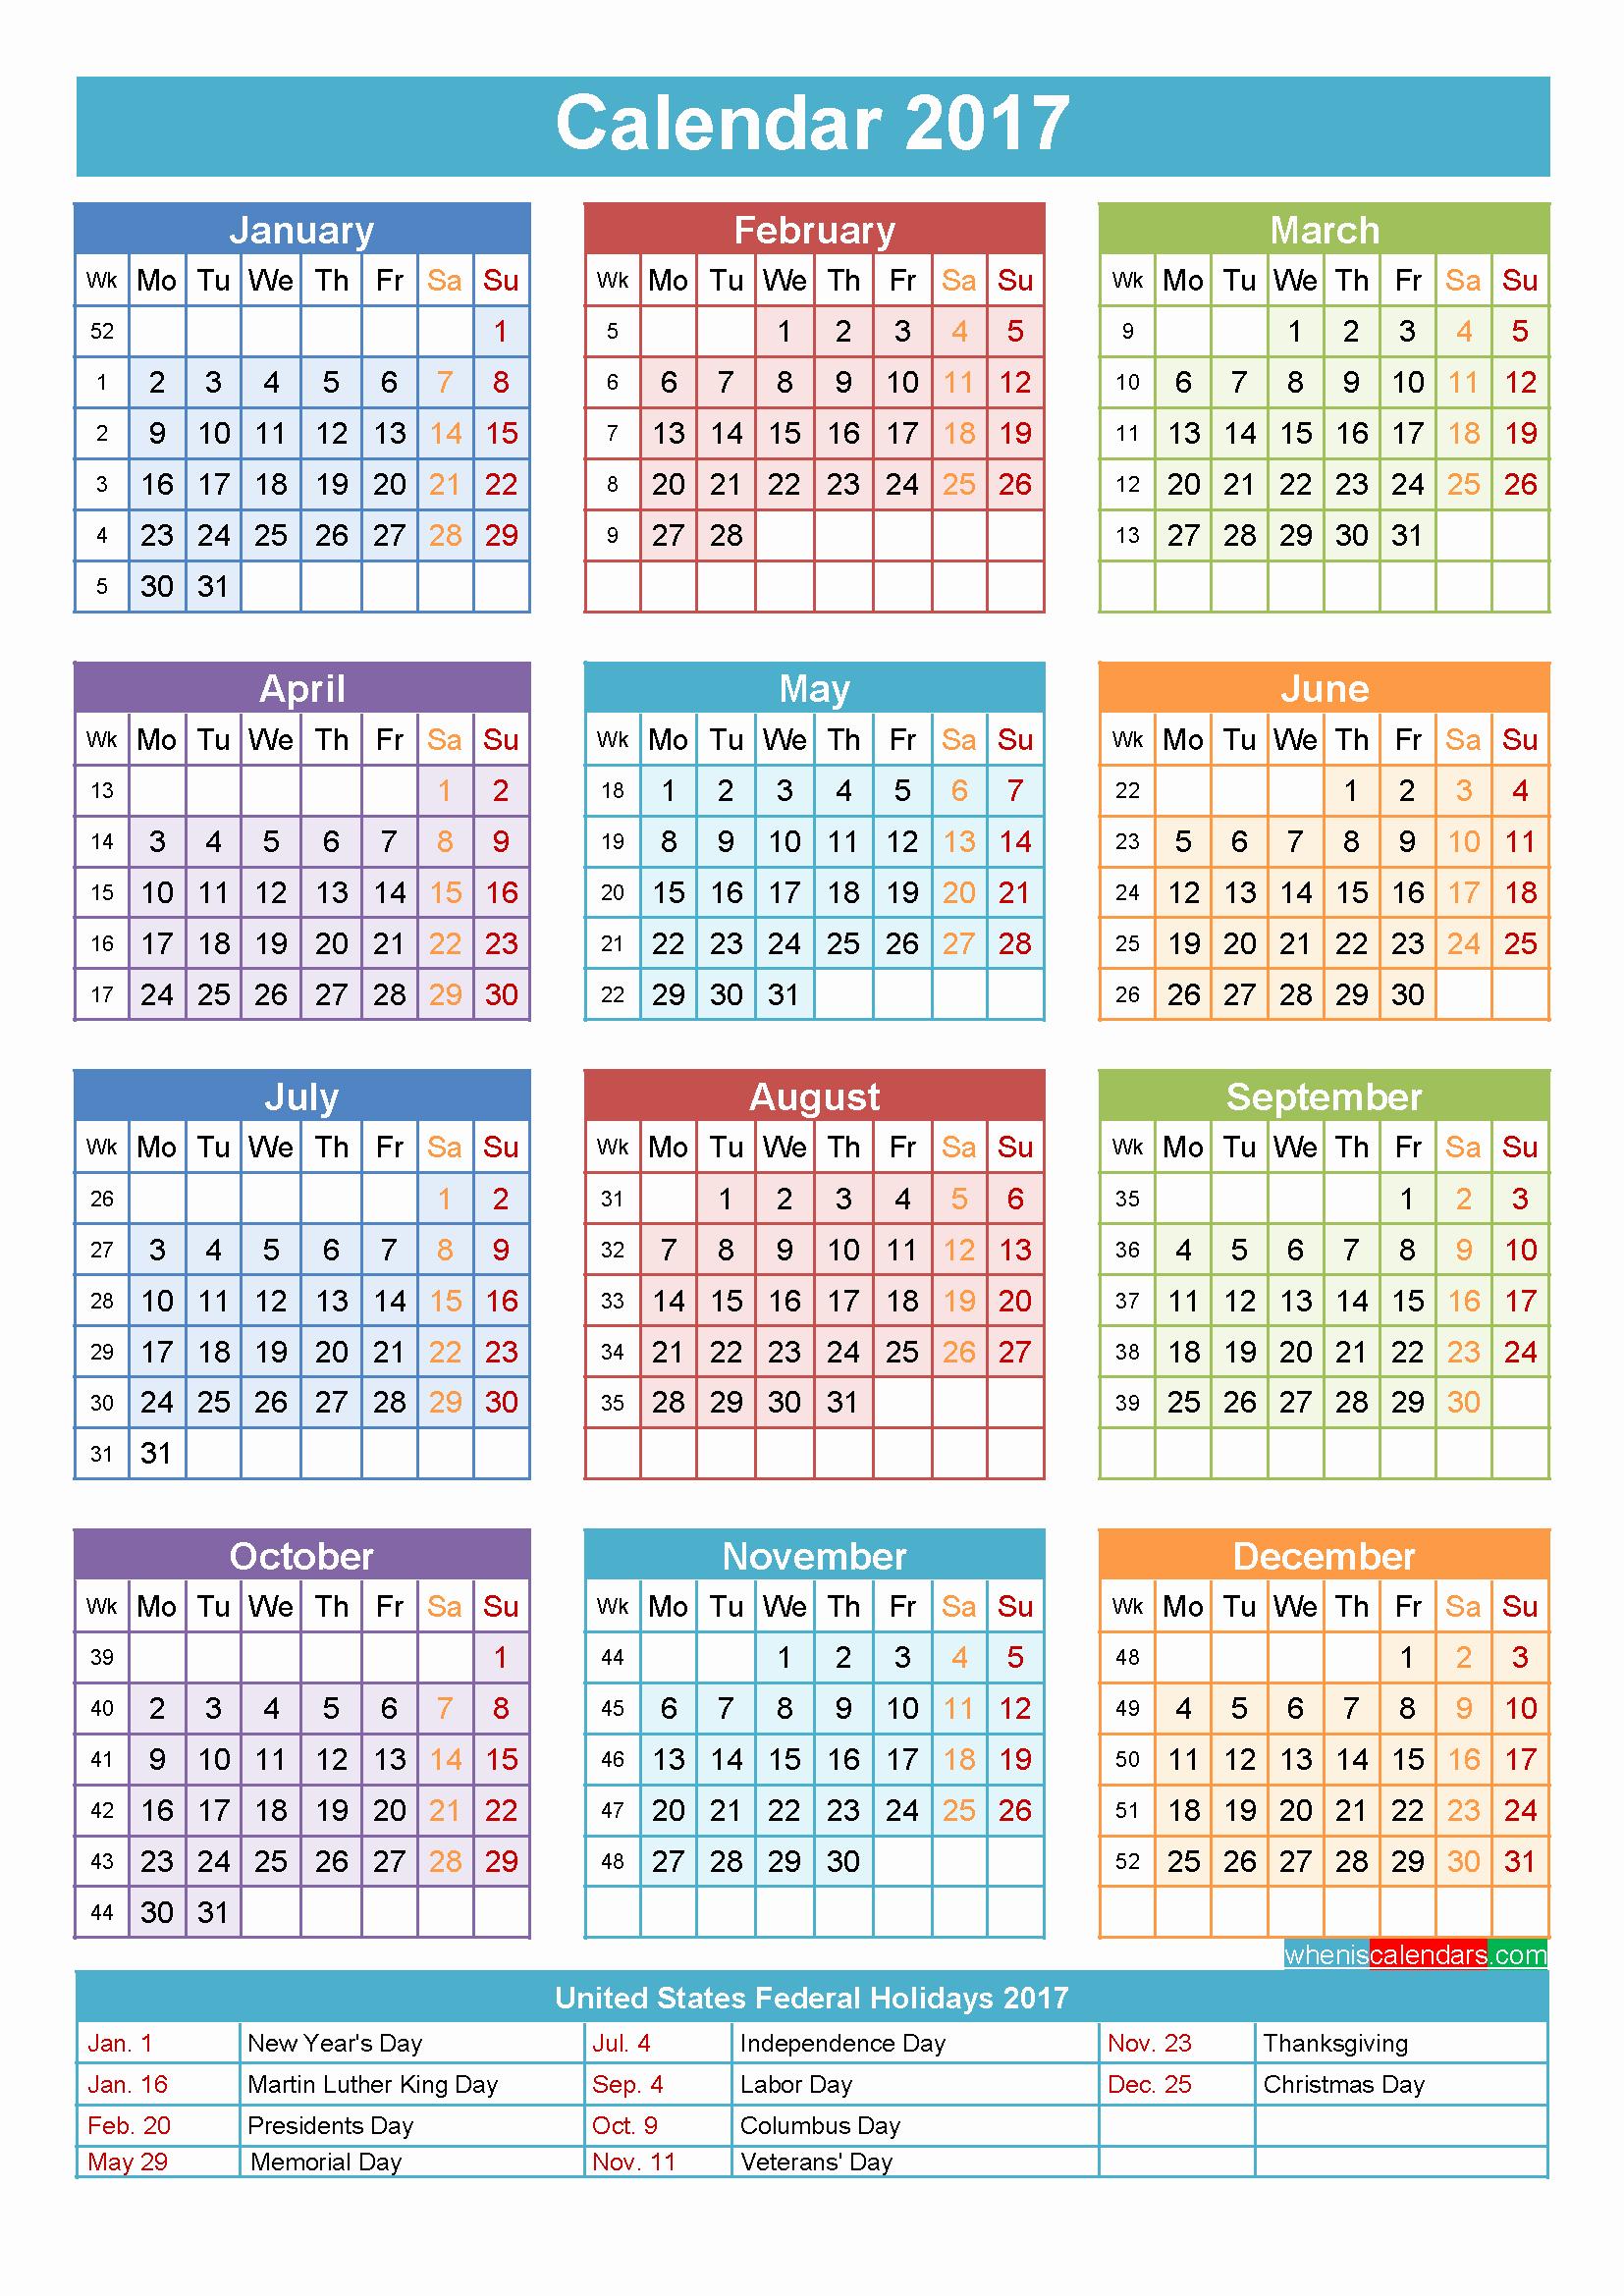 Calendar 2017 Template with Holidays Inspirational 2017 Calendar with Holidays Printable Yearly Calendar